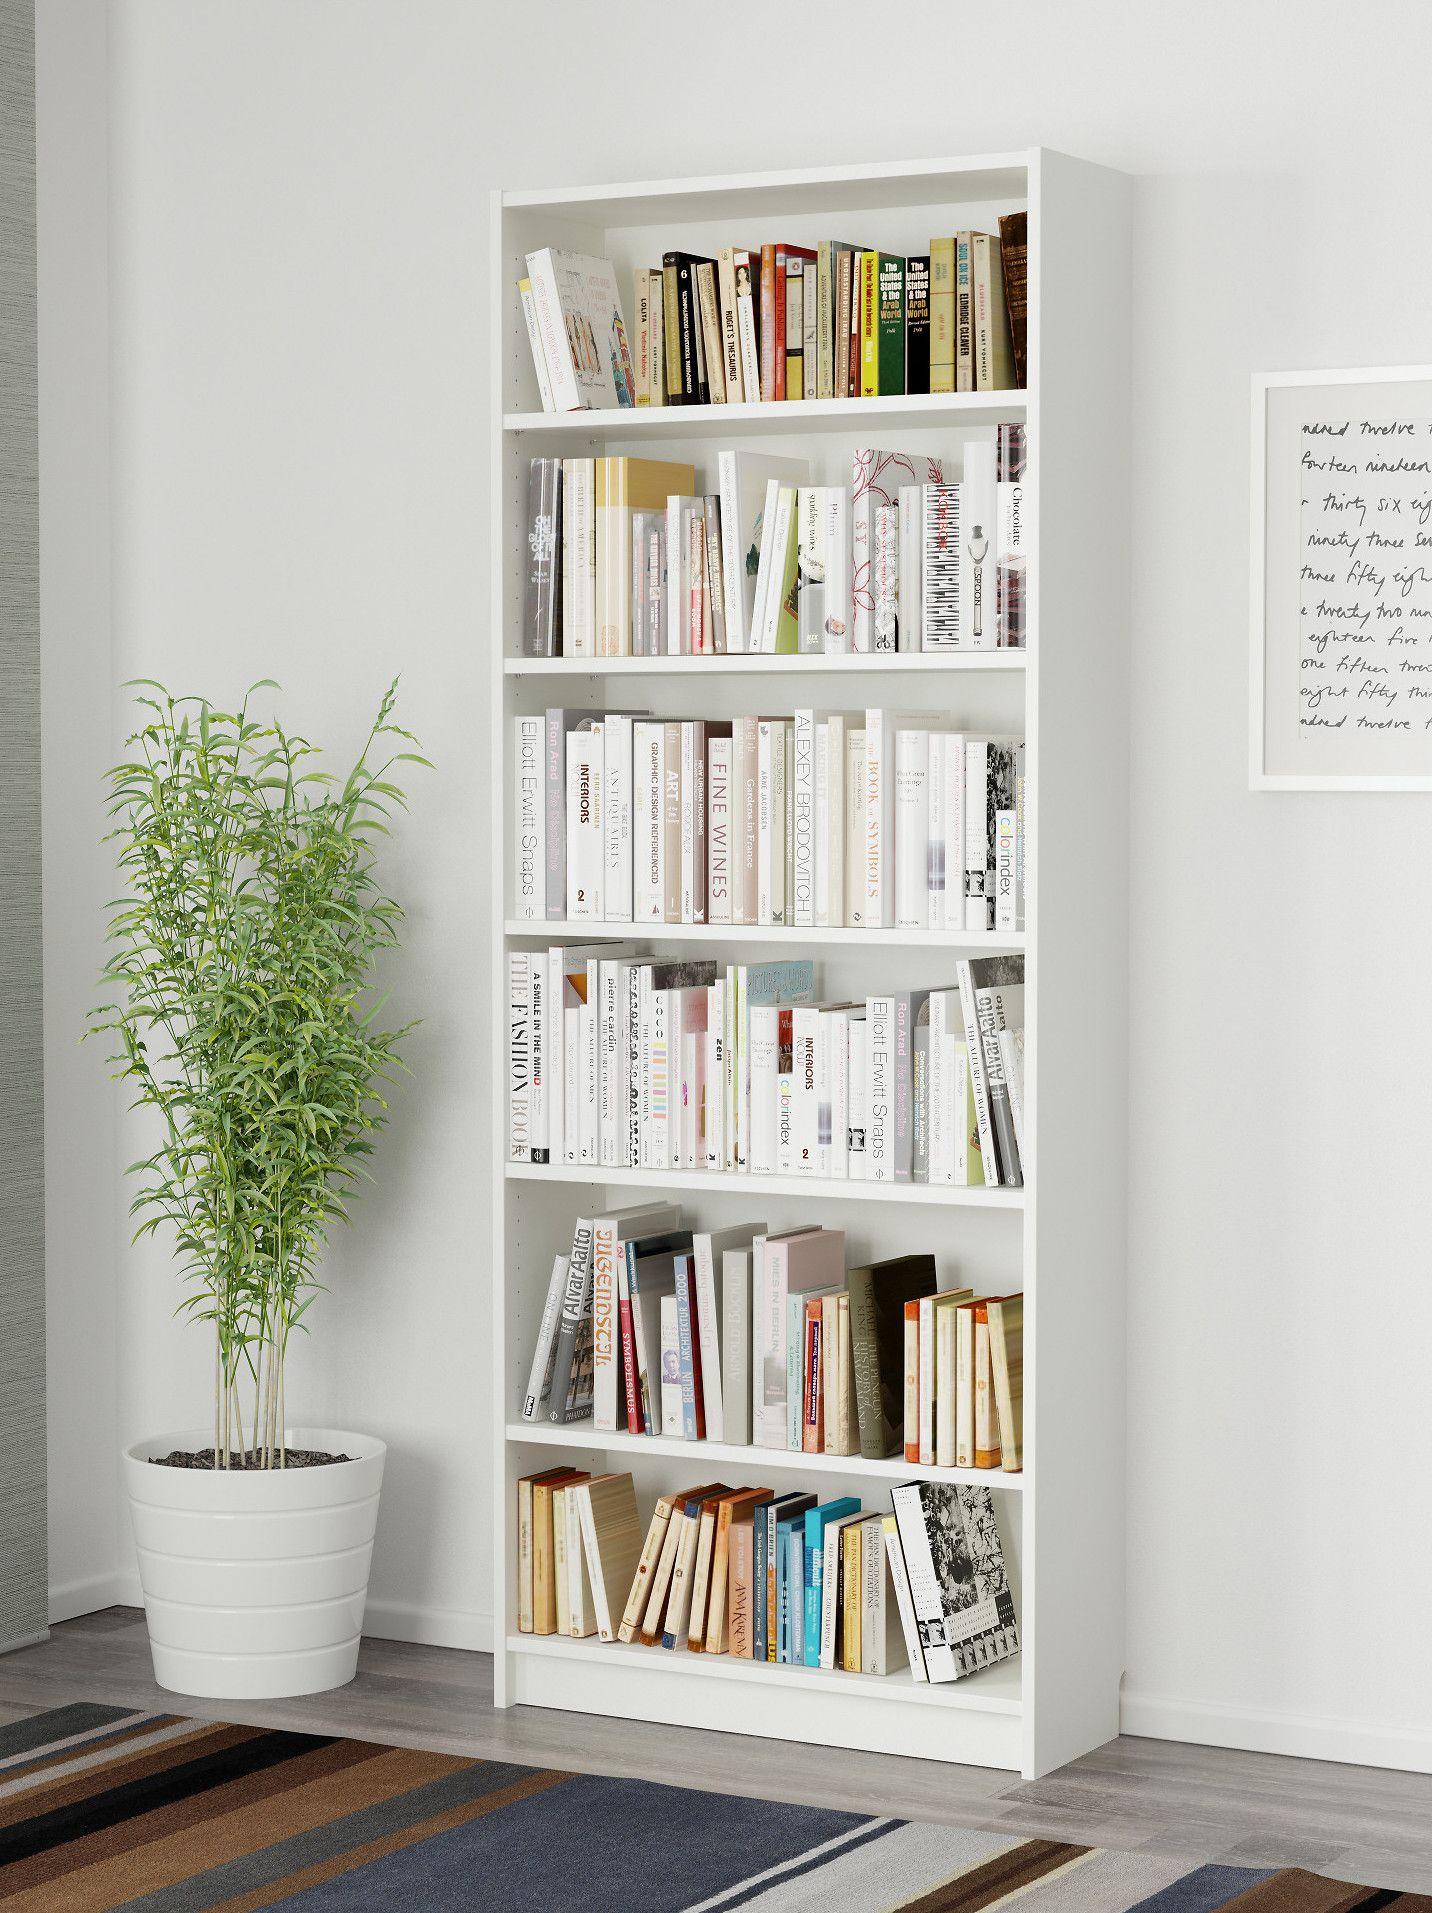 Ikea Billy Bookcase Sale November 2017 Online Discount Ikea Bookshelves White Bookcase Ikea Billy Bookcase